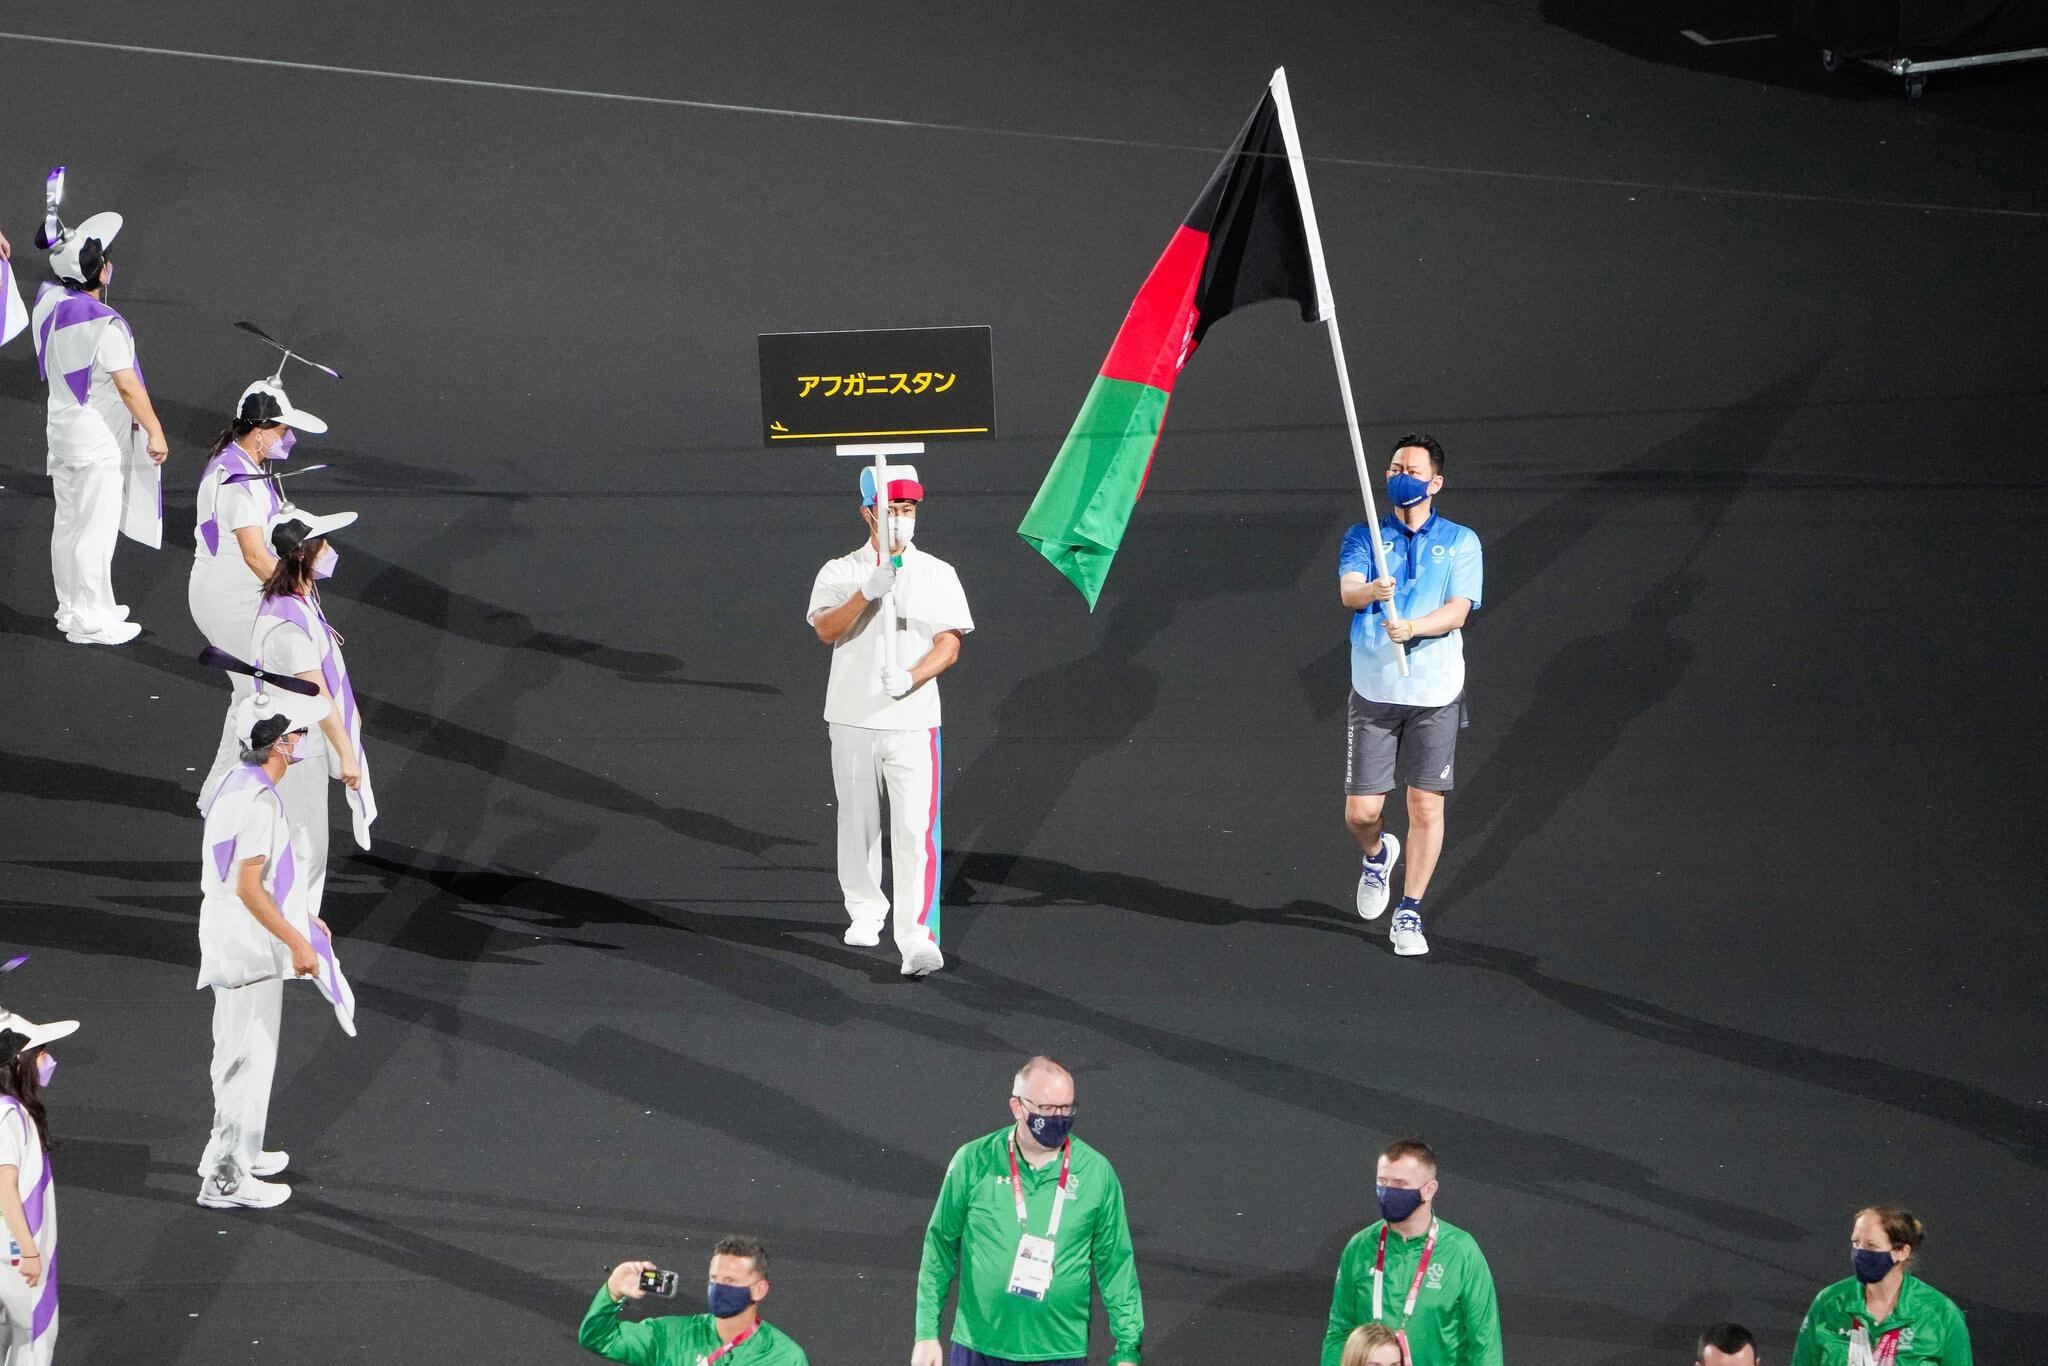 24paralympic-briefing-afghan-flag-superJumbo